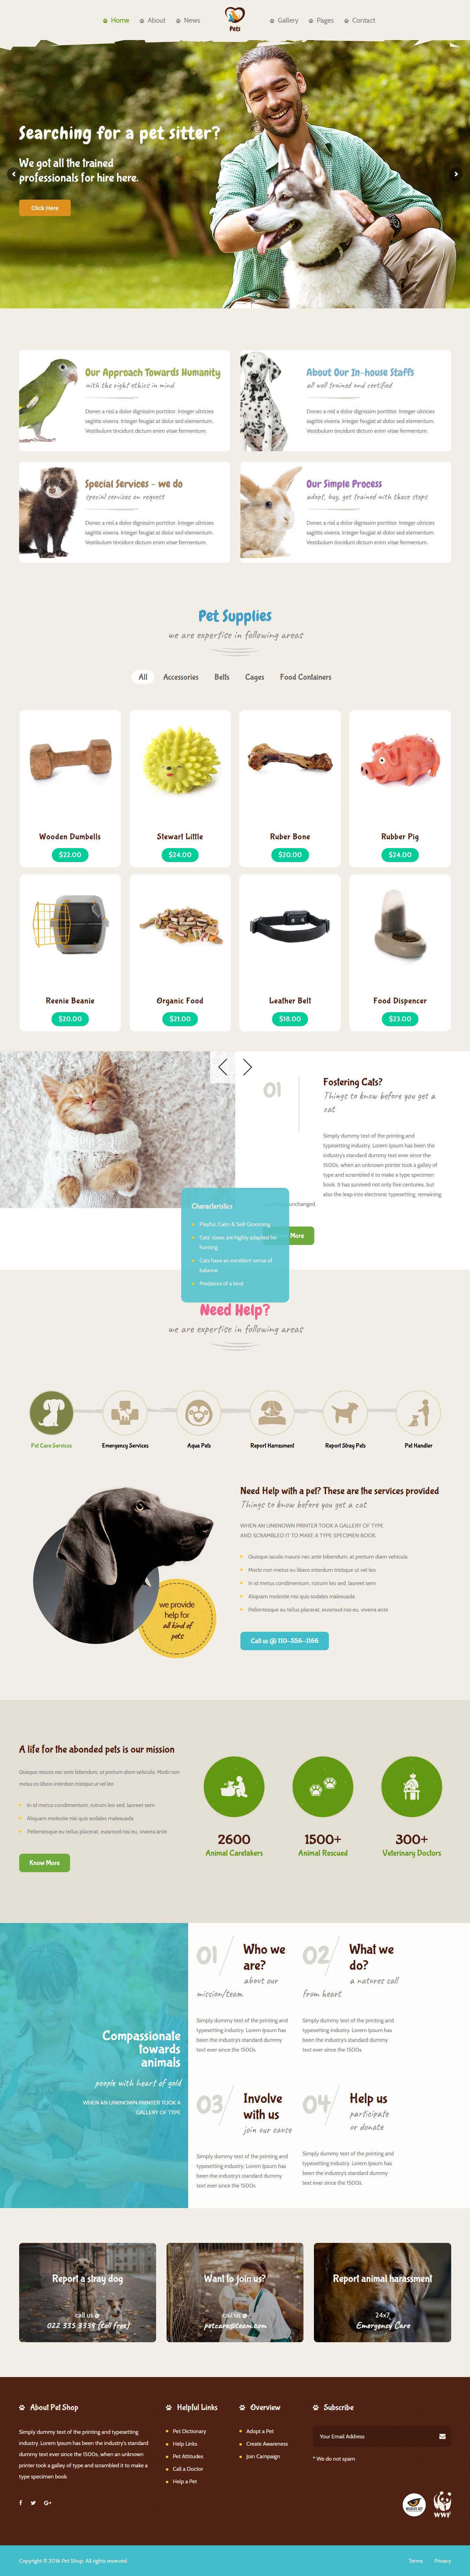 Pet World - Best Premium Animal and Pet WordPress Theme